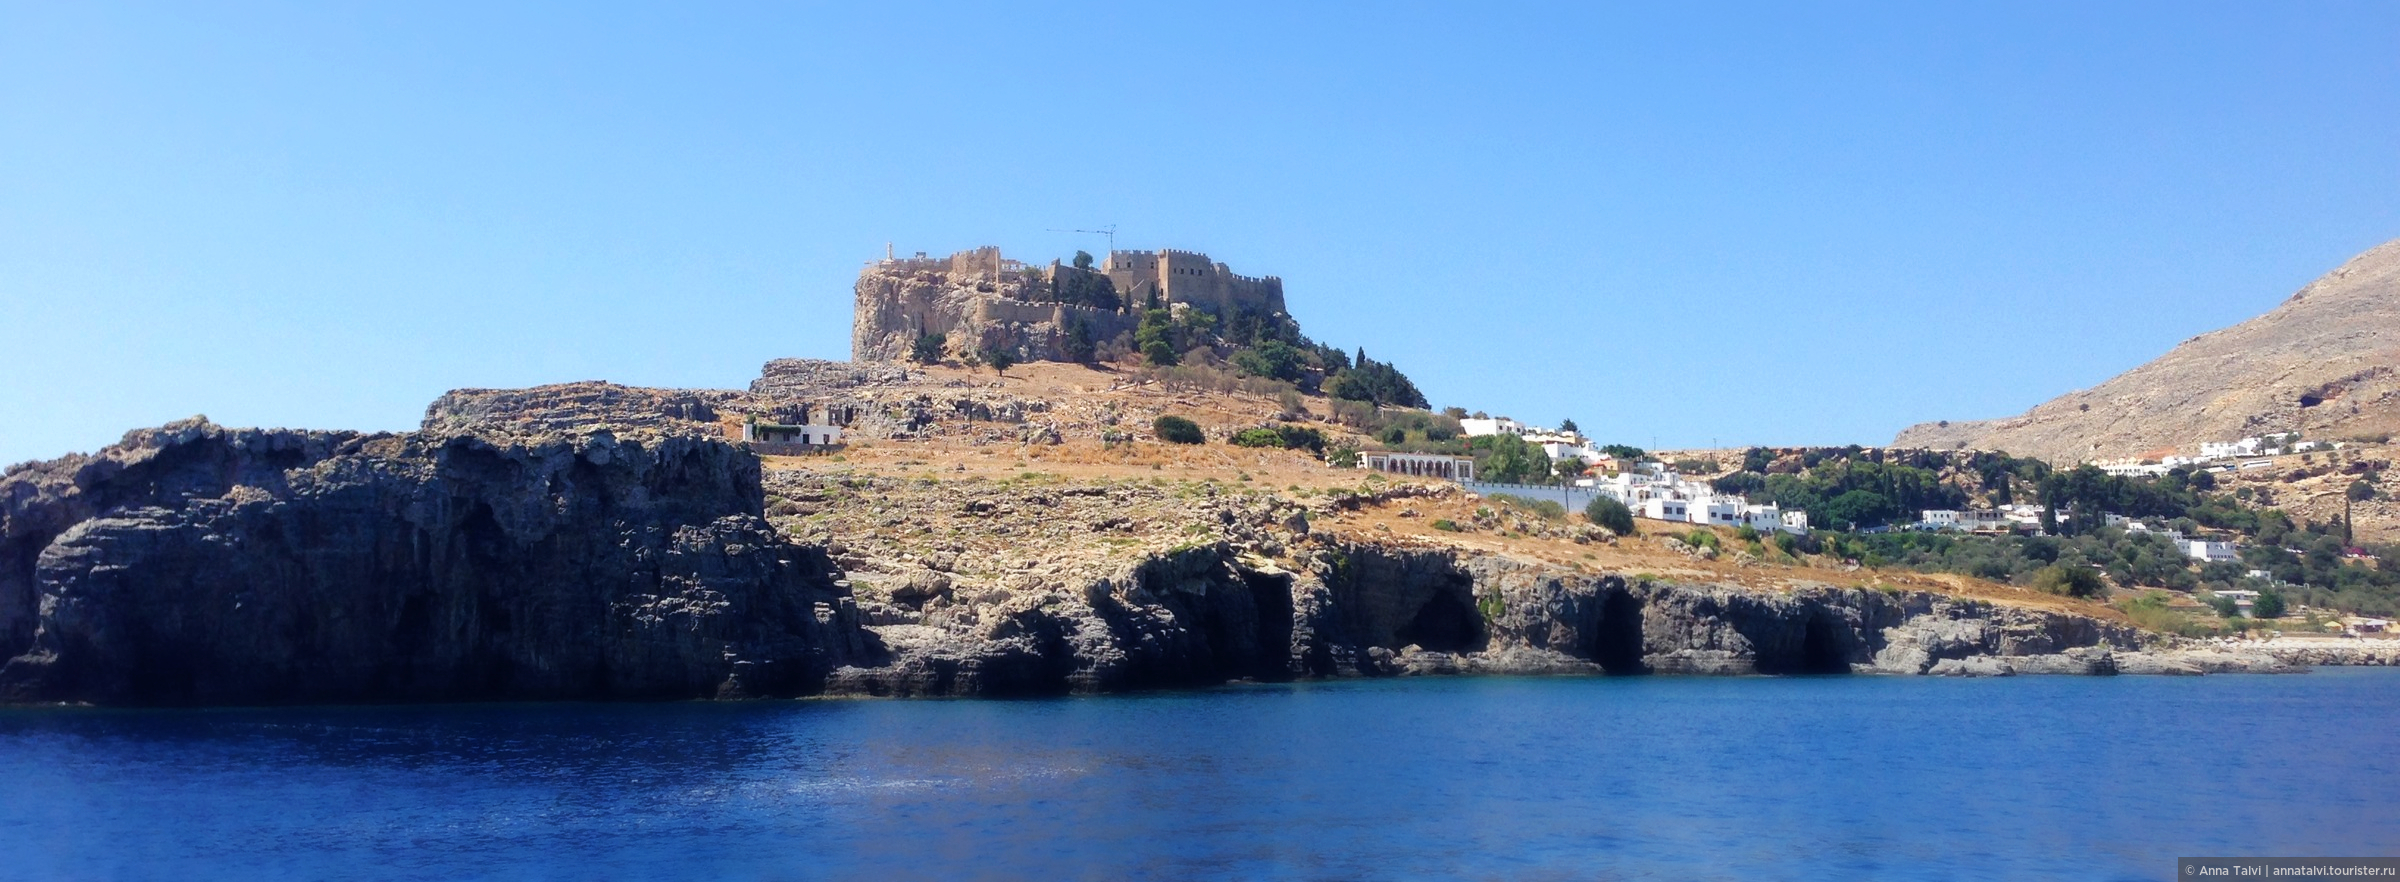 Остров родос линдос